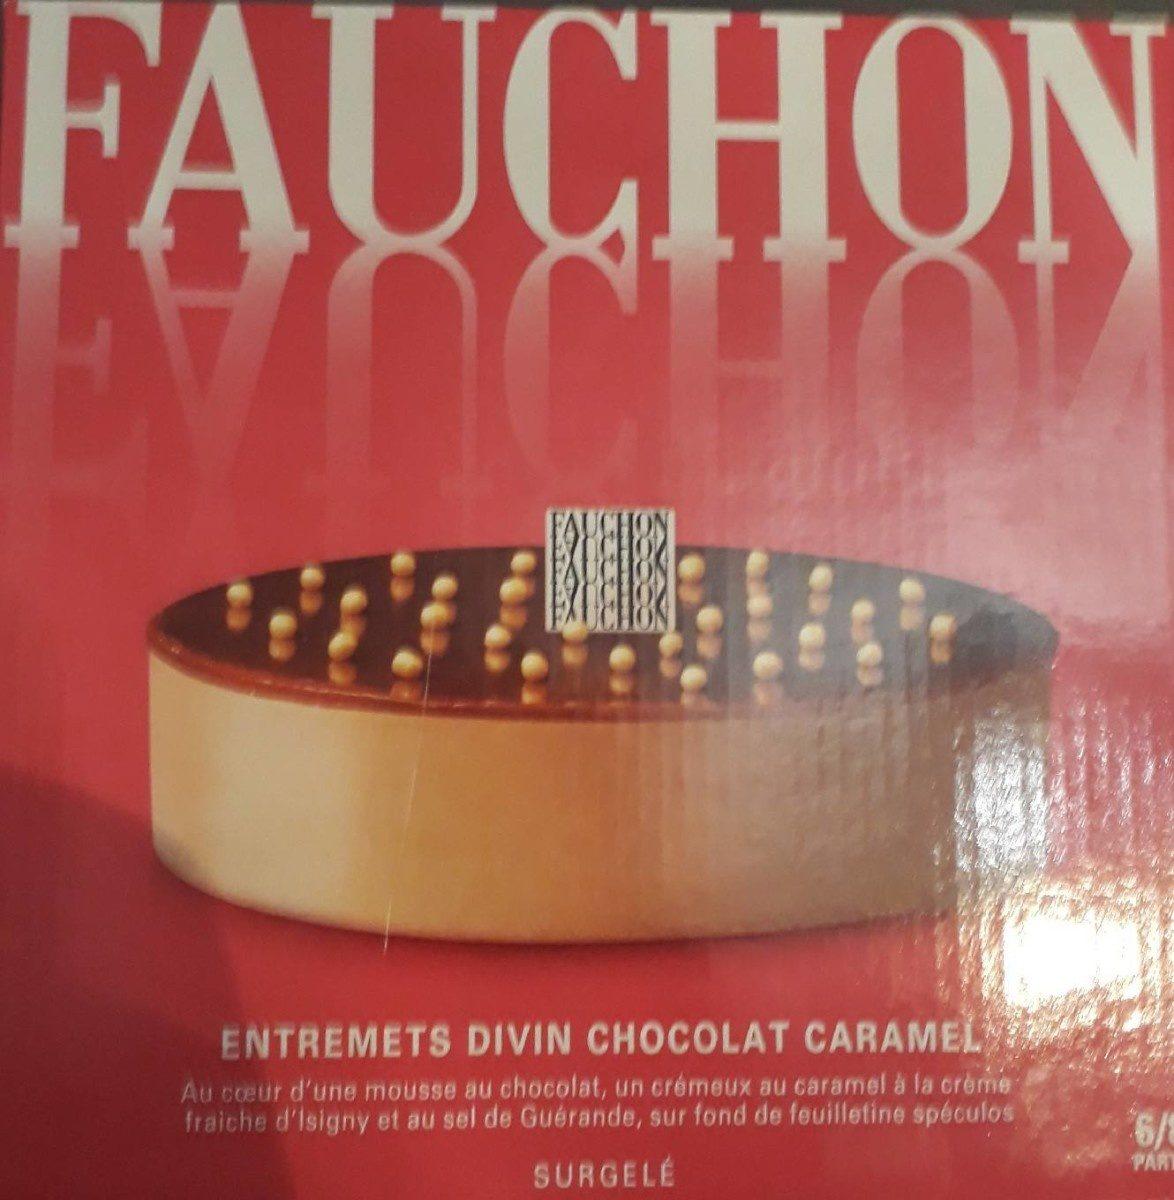 Entremets divin chocolat caramel - Product - fr